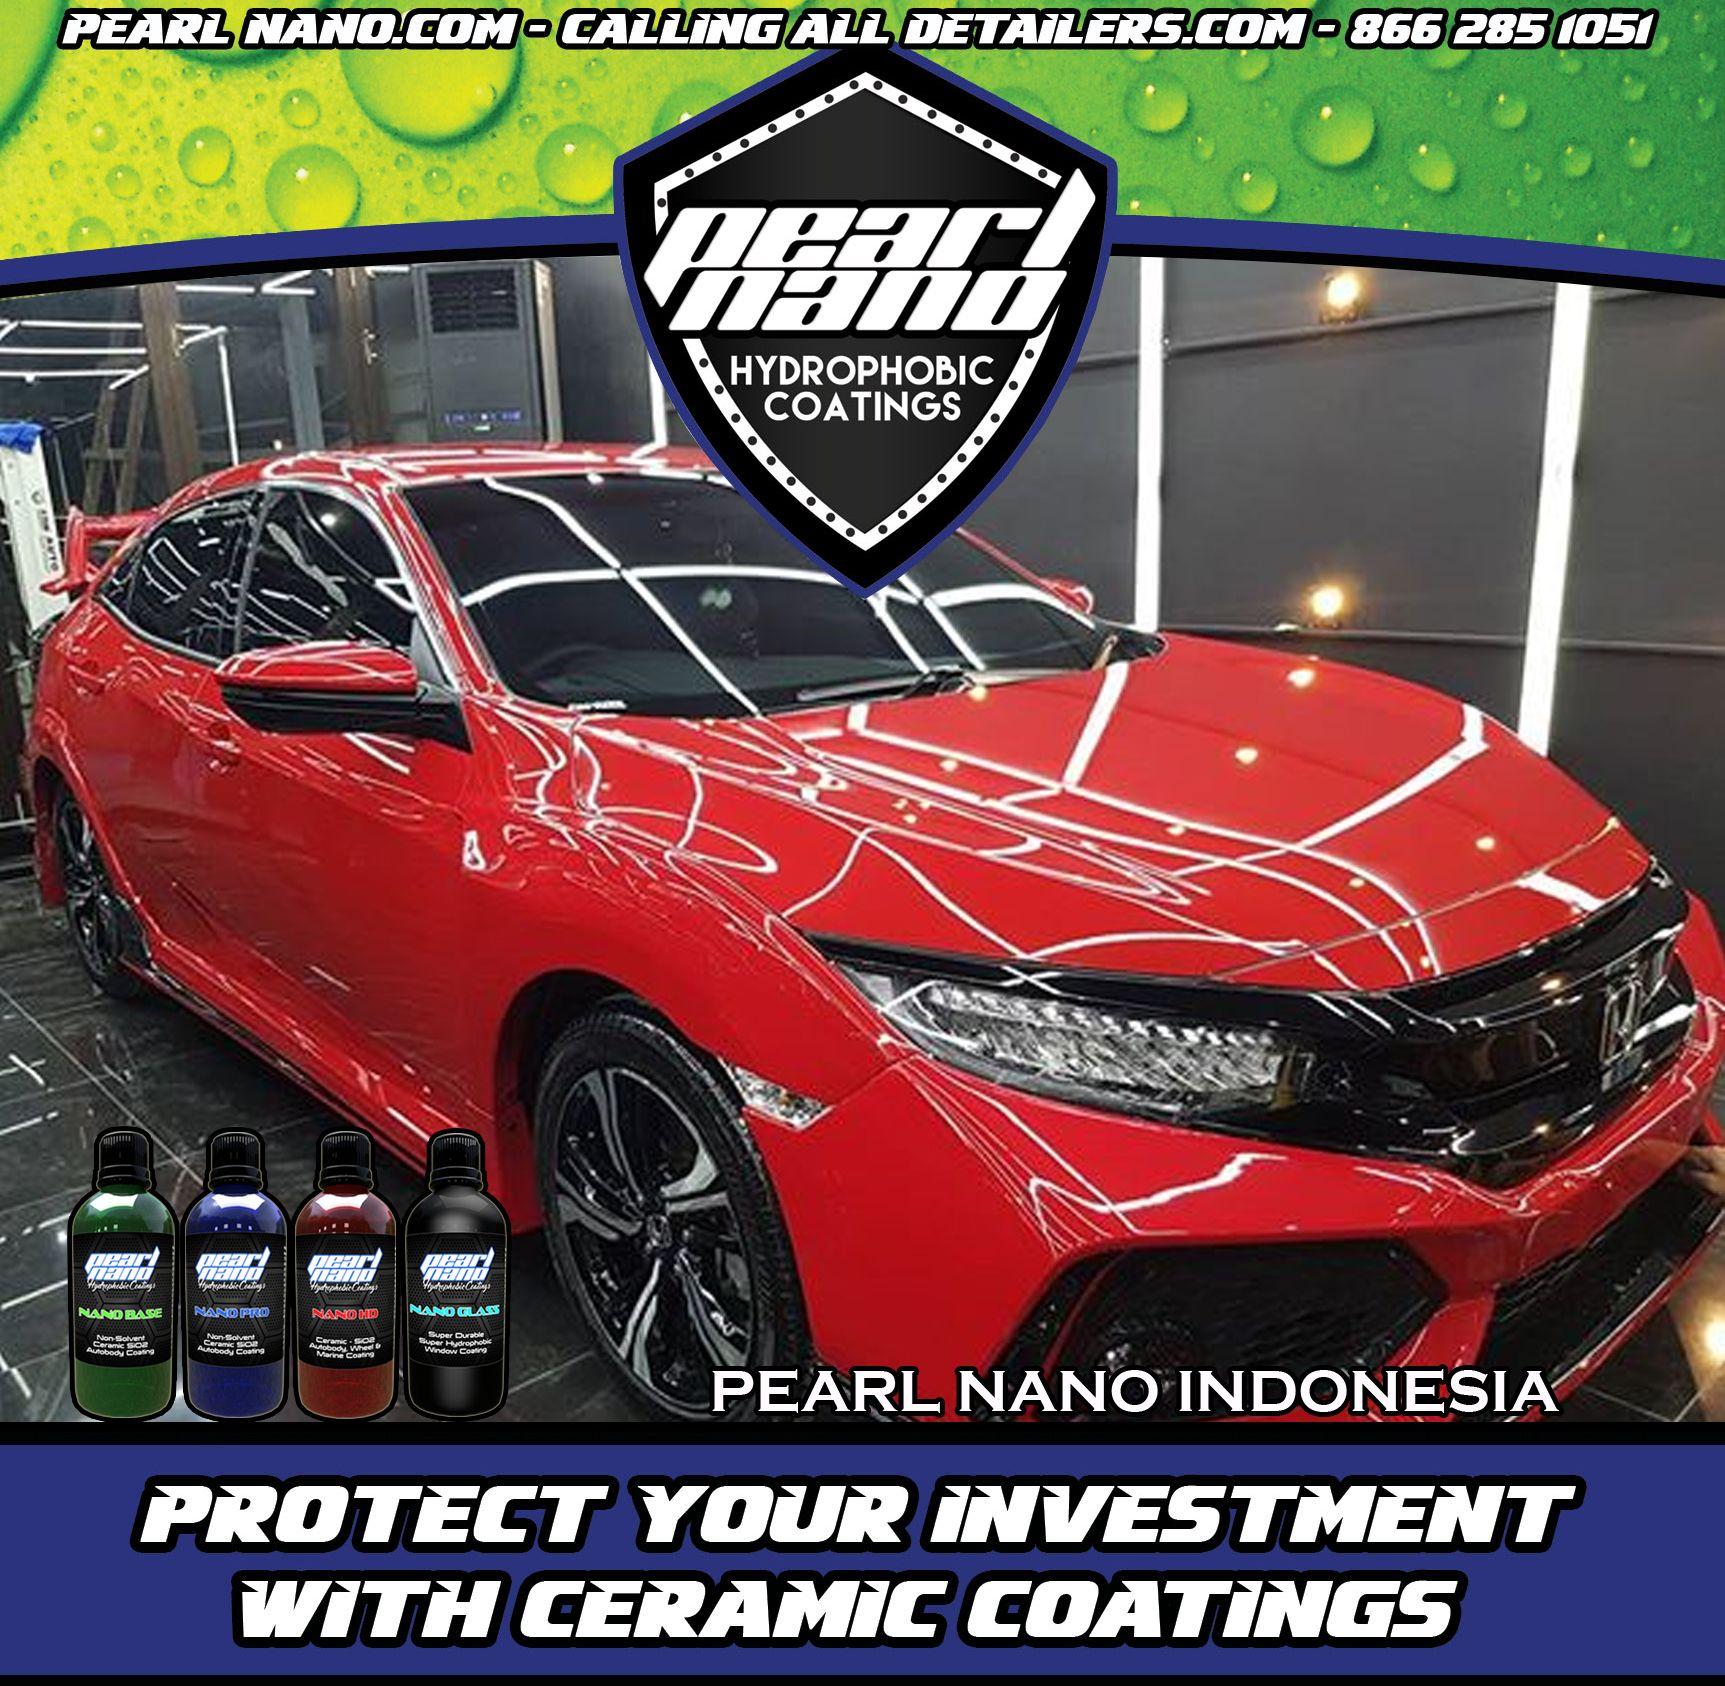 Honda Civic Turbo Hatchback After Detailing Pearl Nano Package Pearl Nano Coatings By Pearl Nano Indonesia Erw Honda Civic Turbo Turbo Hatchback Hydrophobic